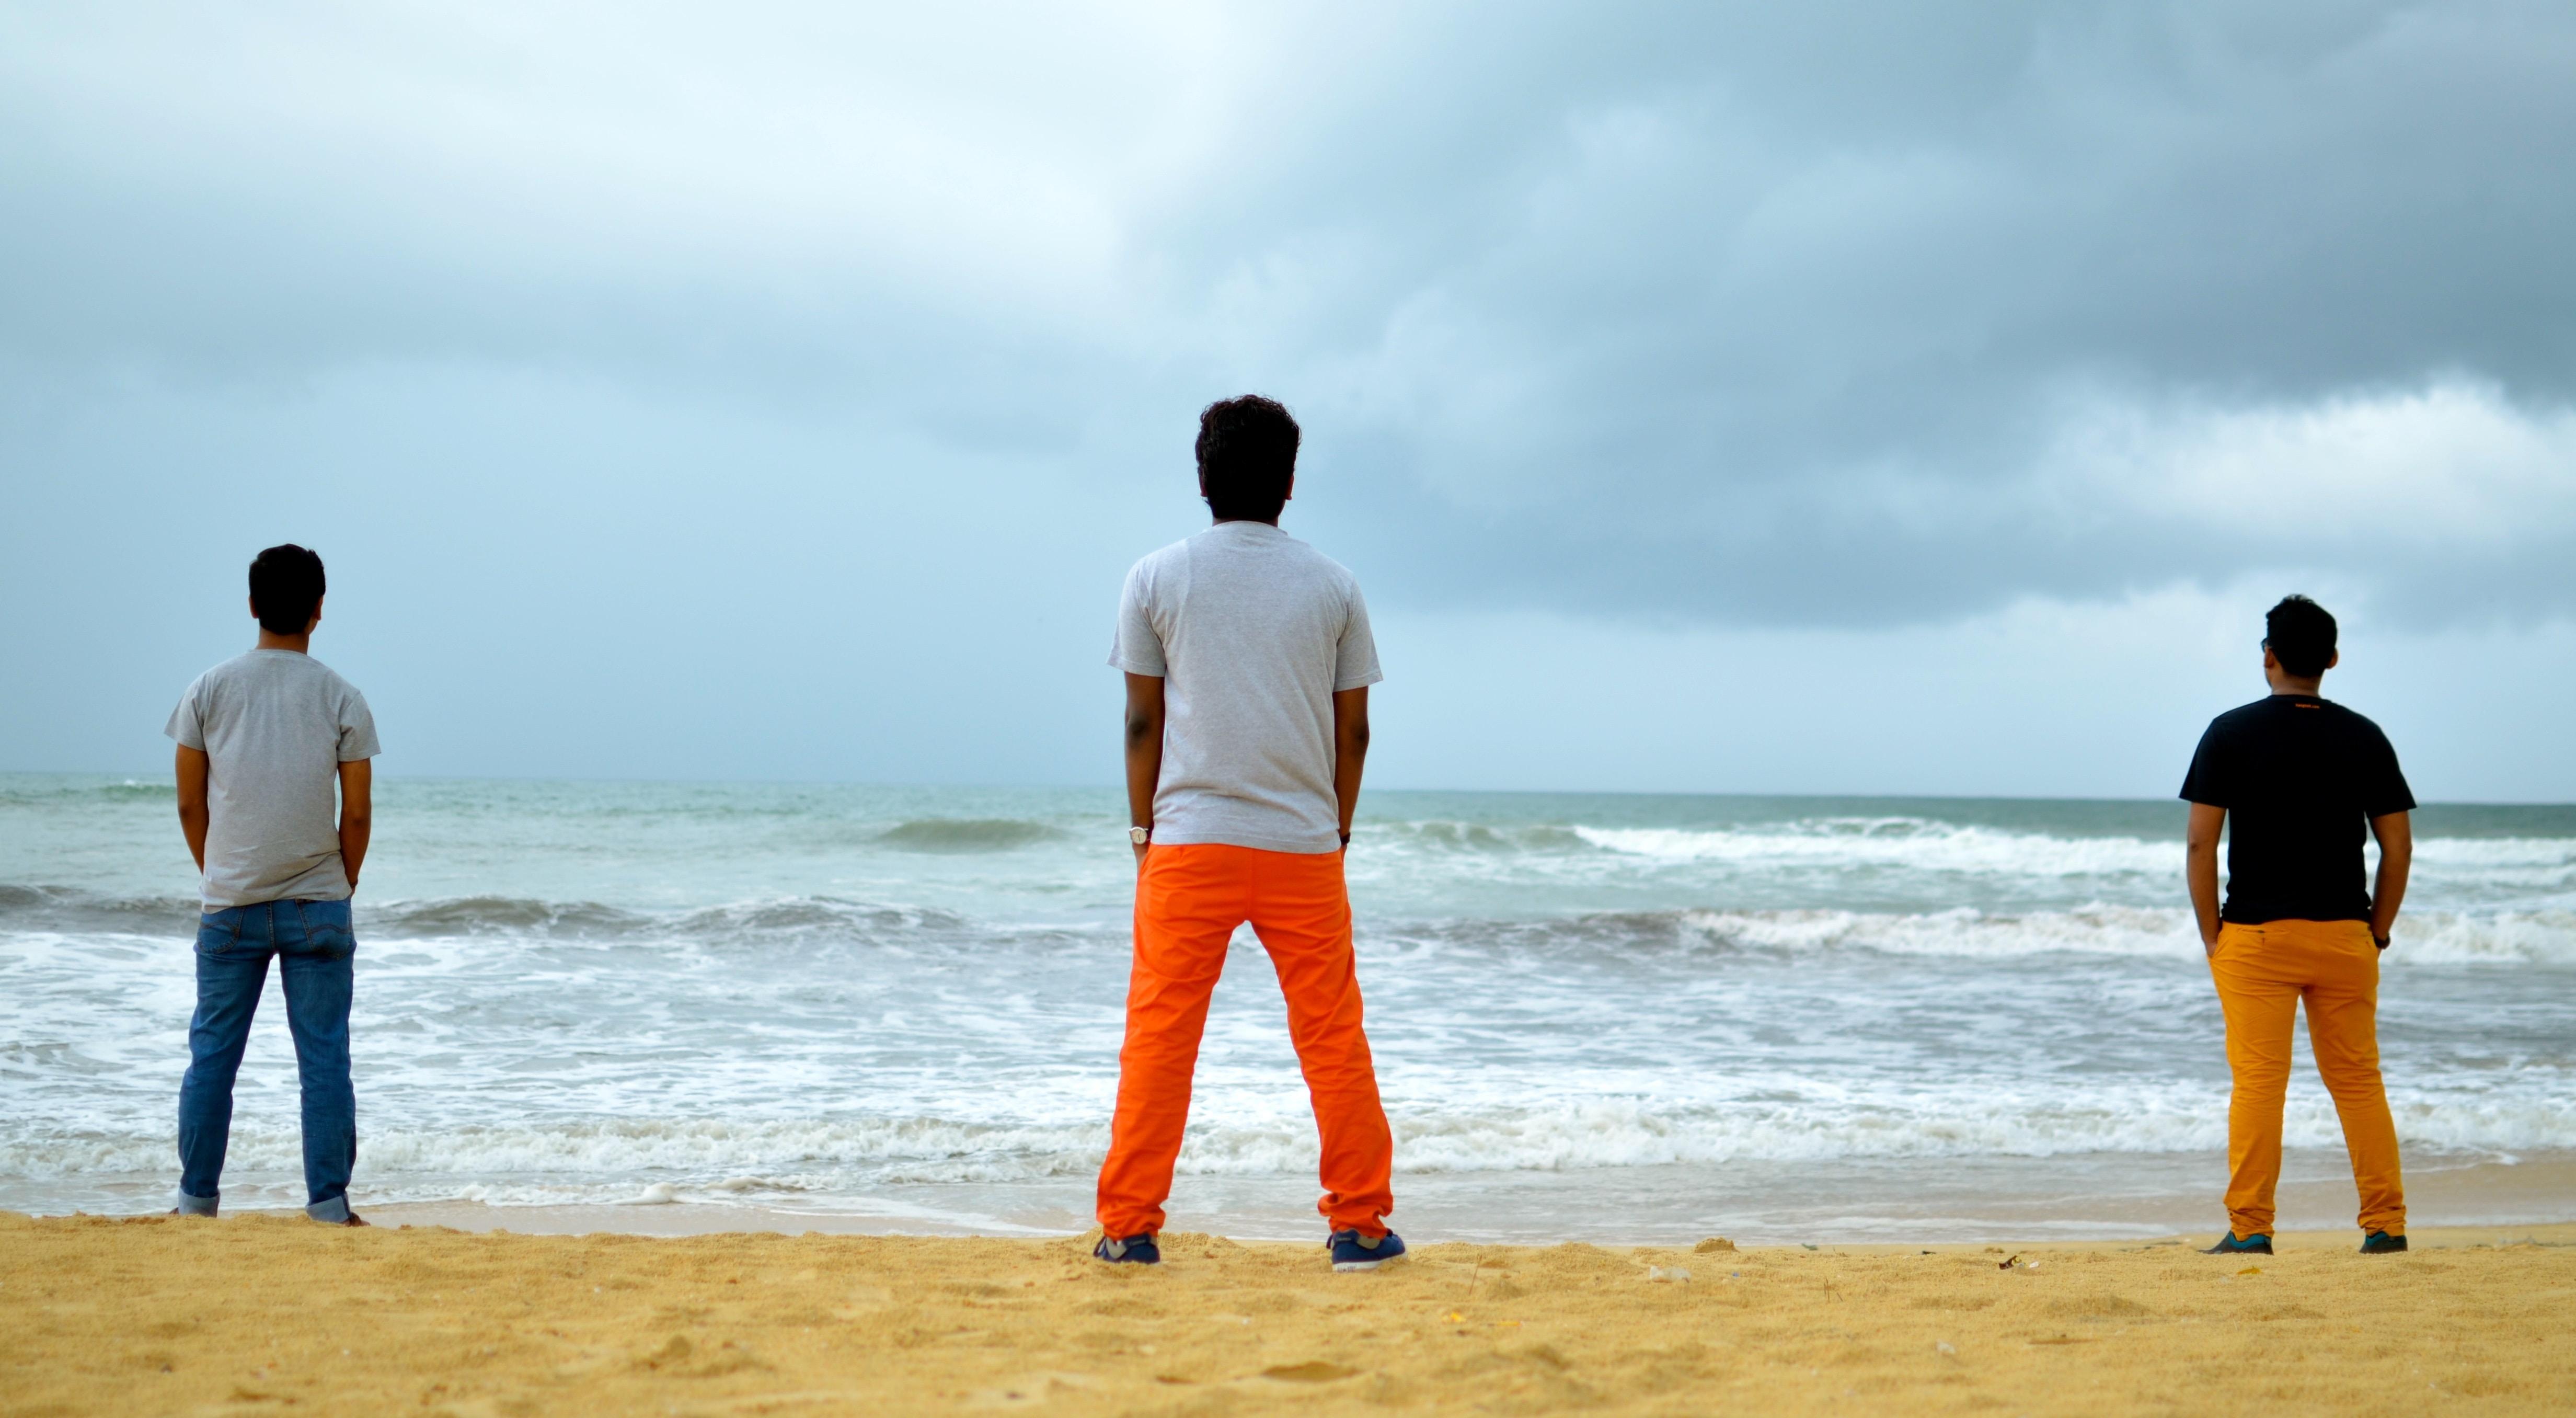 Free Unsplash photo from Jayakumar Ananthan